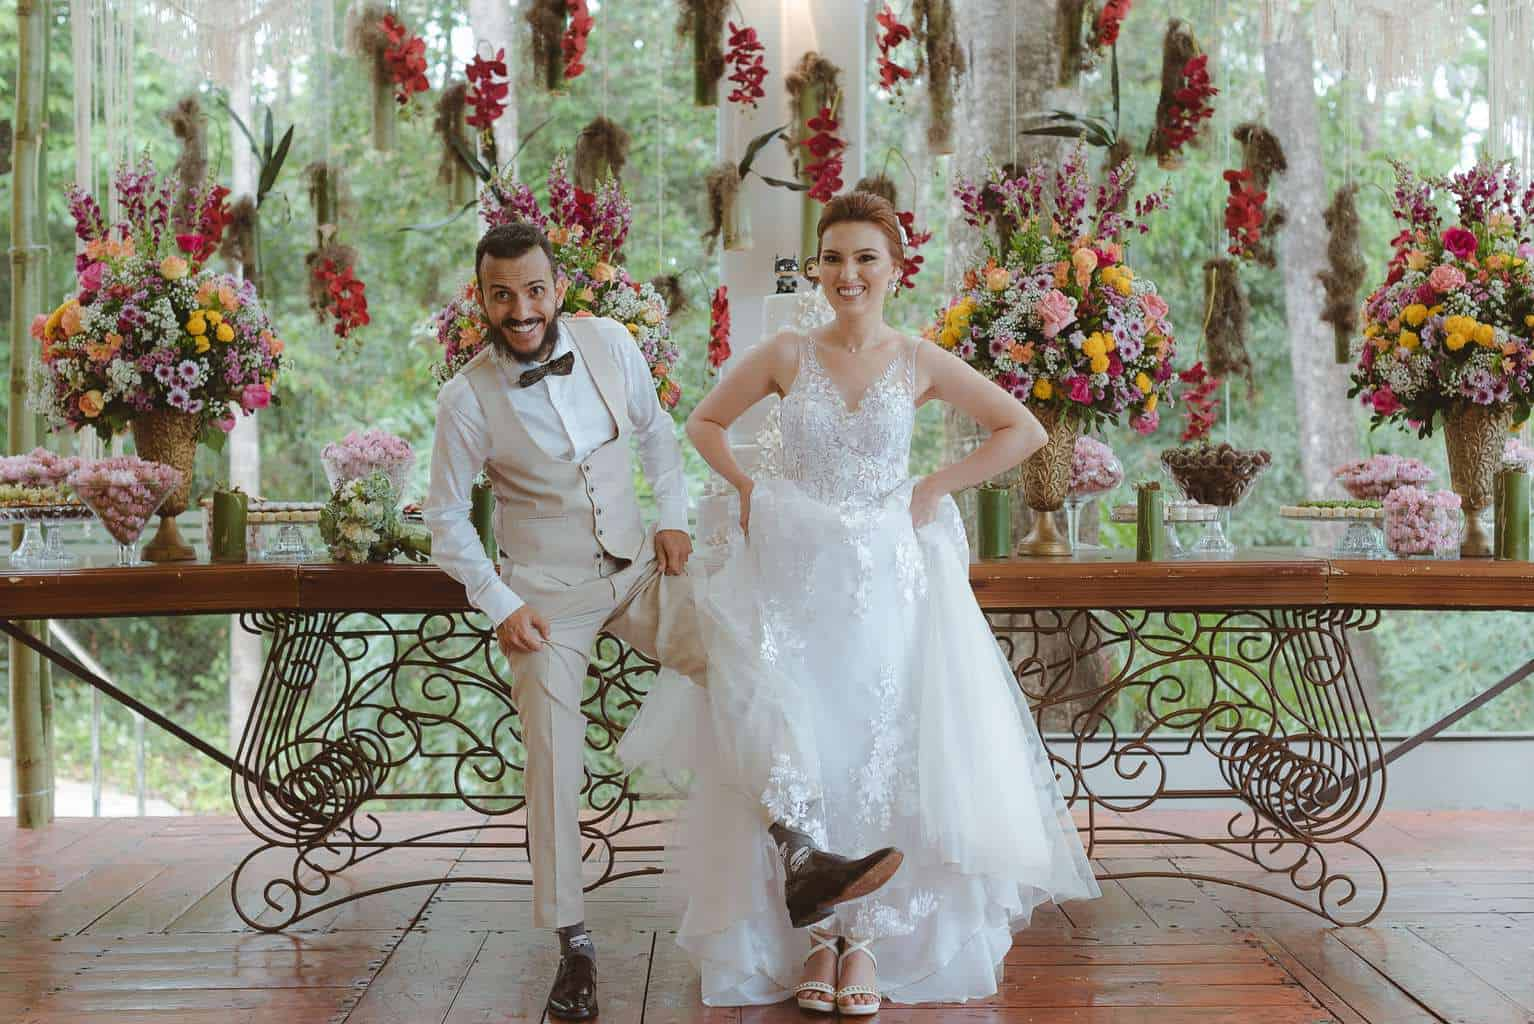 casamento-ao-ar-livre-casamento-boho-casamento-geek-casamento-rustico-casamento-Thais-e-Pedro-Revoar-Fotografia-Villa-Borghese-Eventos-59